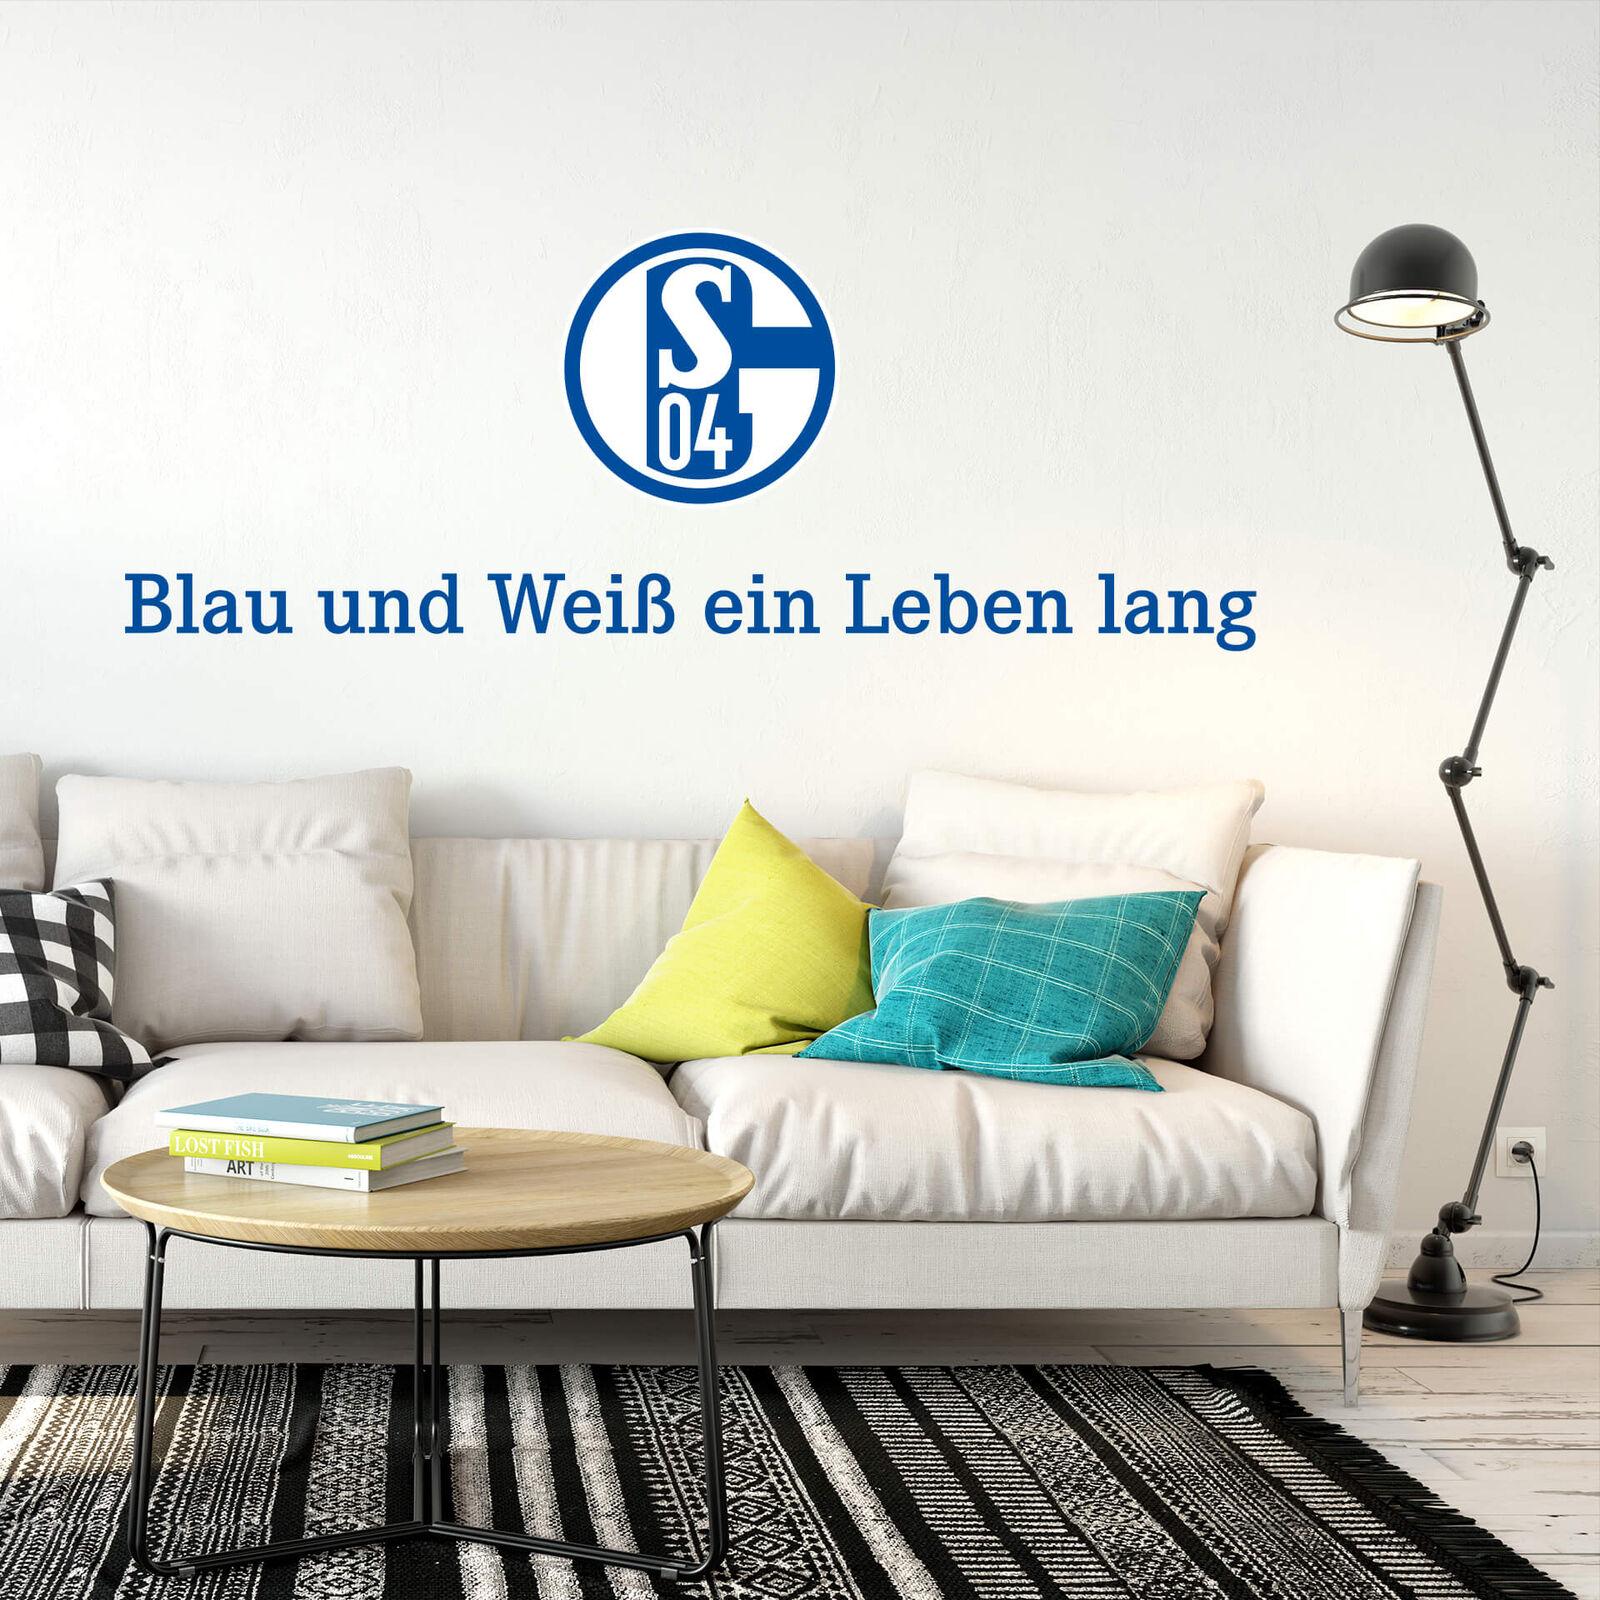 Wandtattoo Schalke 04 Blau und Weiß ein Leben lang lang lang Fanartikel Fanshop S04 Deko e8587f